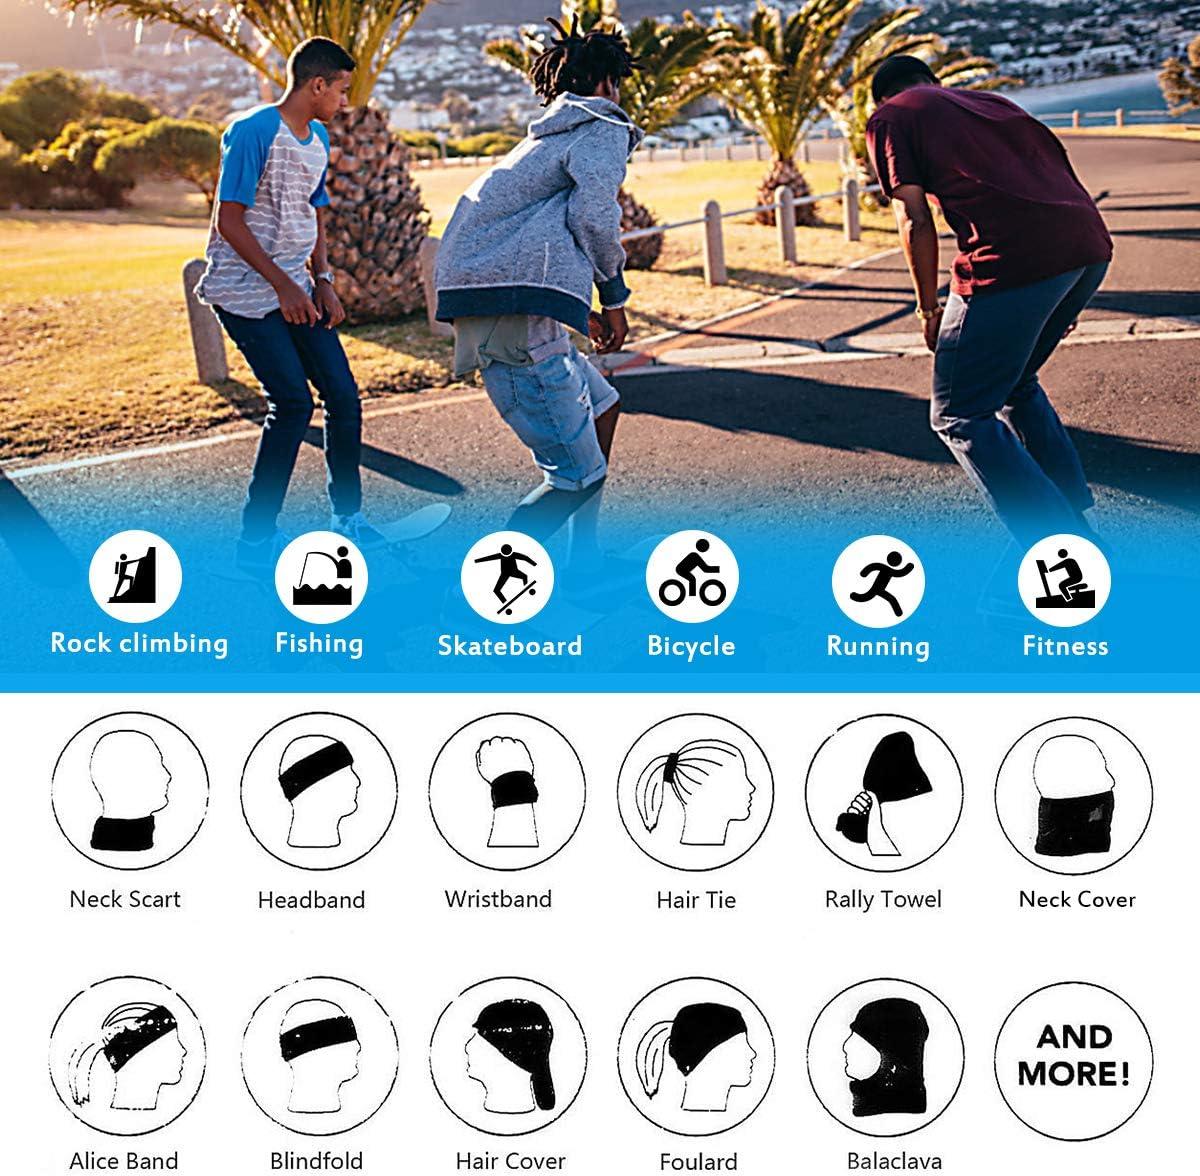 PIKAPU Multifunctional Headwear Fashion Bandana 3D Tube Scarf Outdoors Headwear Tube Elastic Headband Scarf Bandana Stretchy Headwrap Balaclava for Yoga Running Hiking Cycling